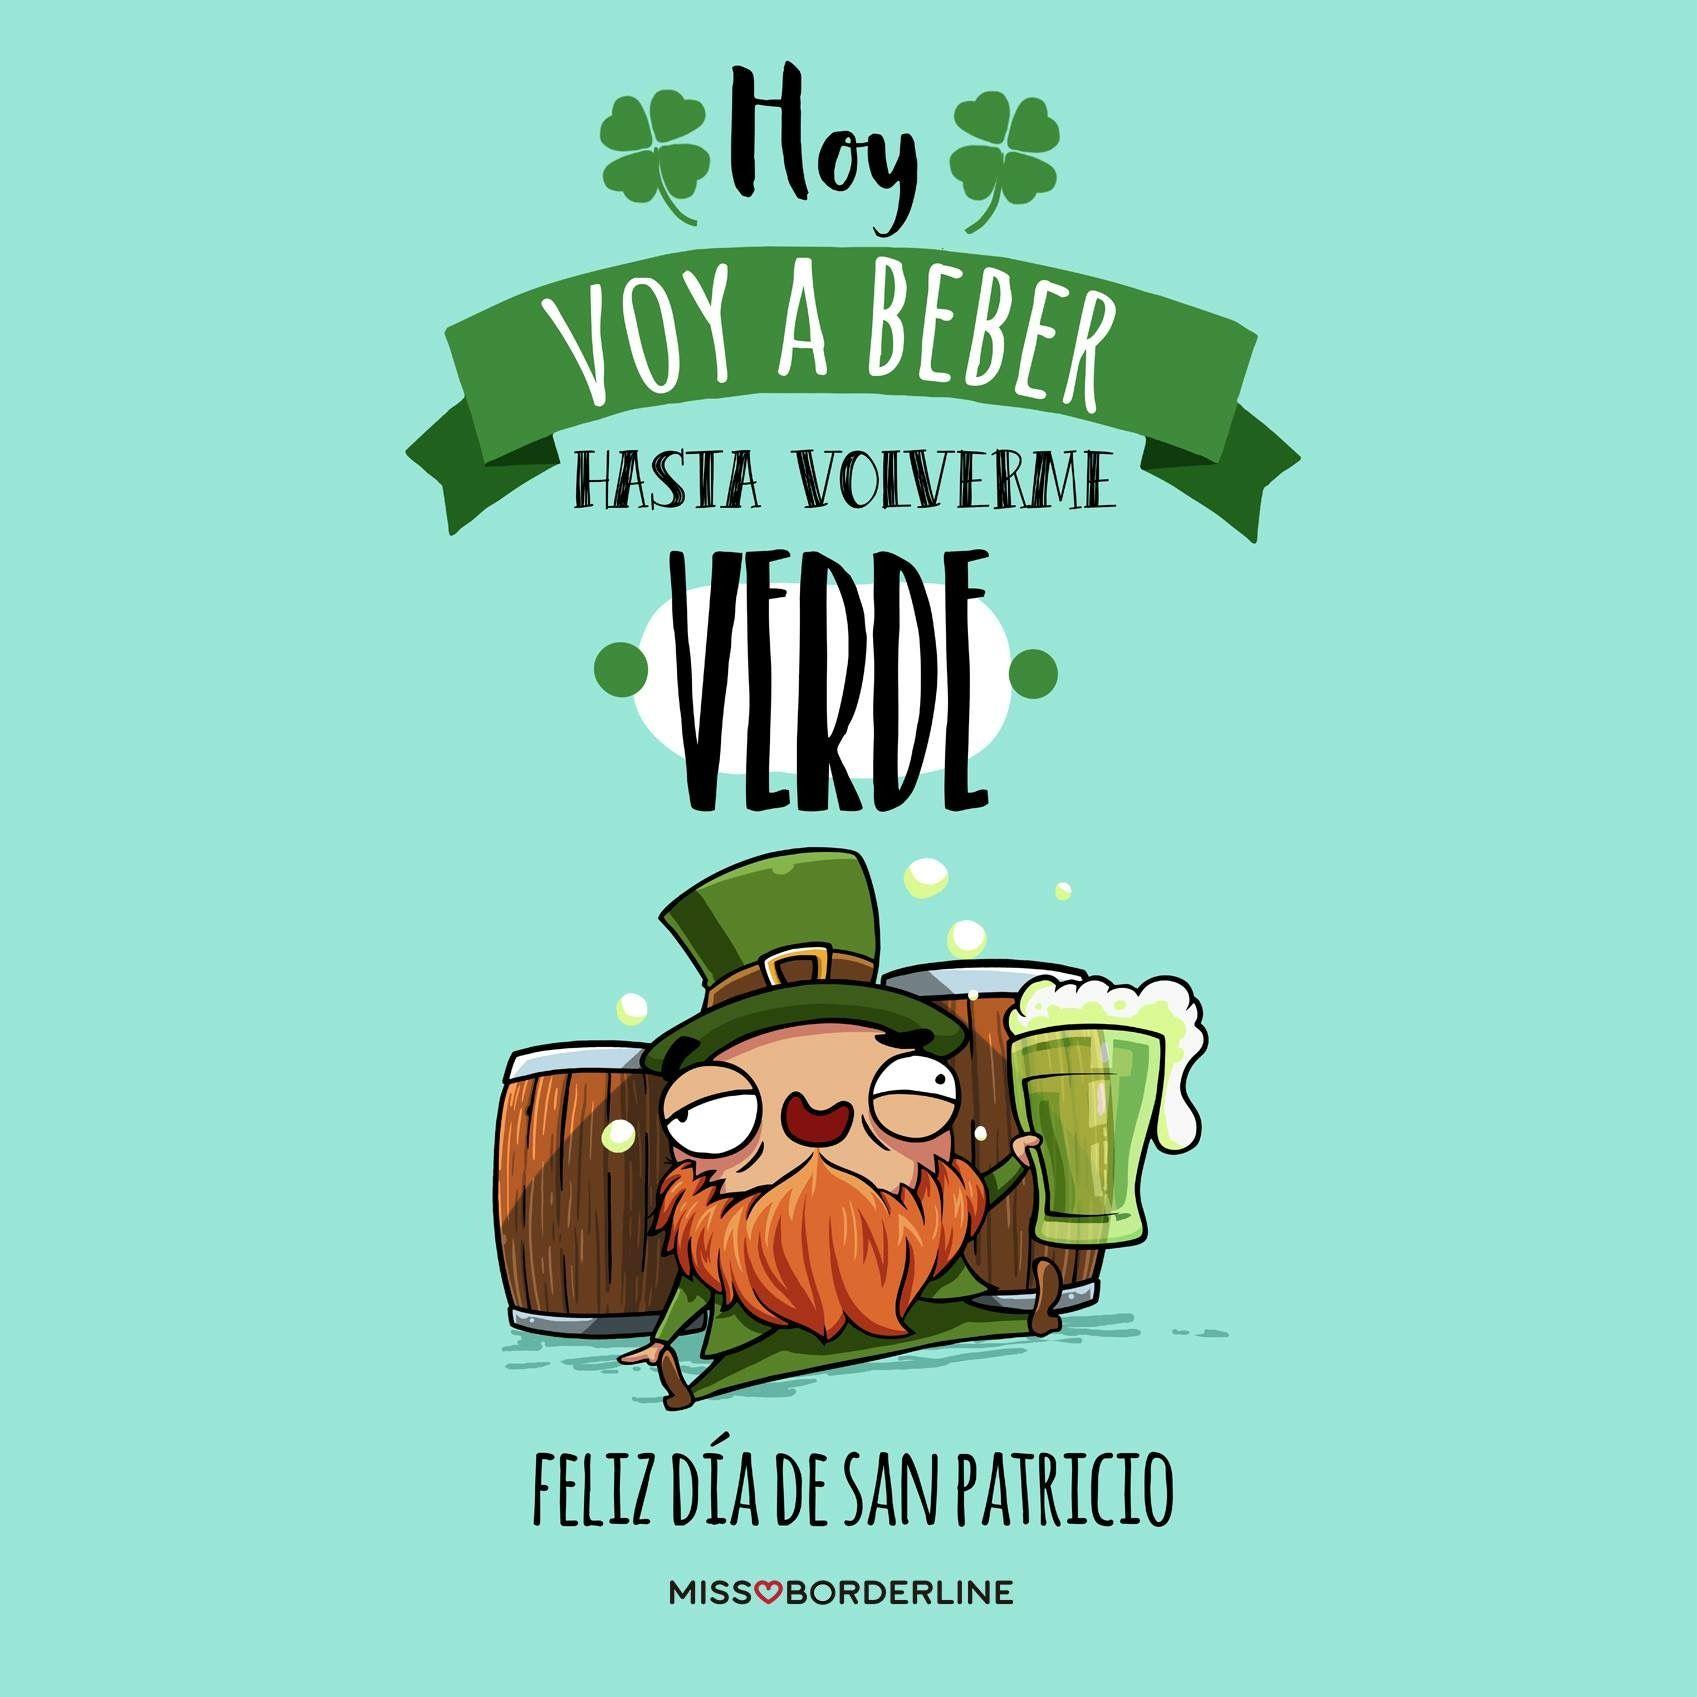 Hoy Voy A Beber Hasta Volverme Verde Feliz Día De San